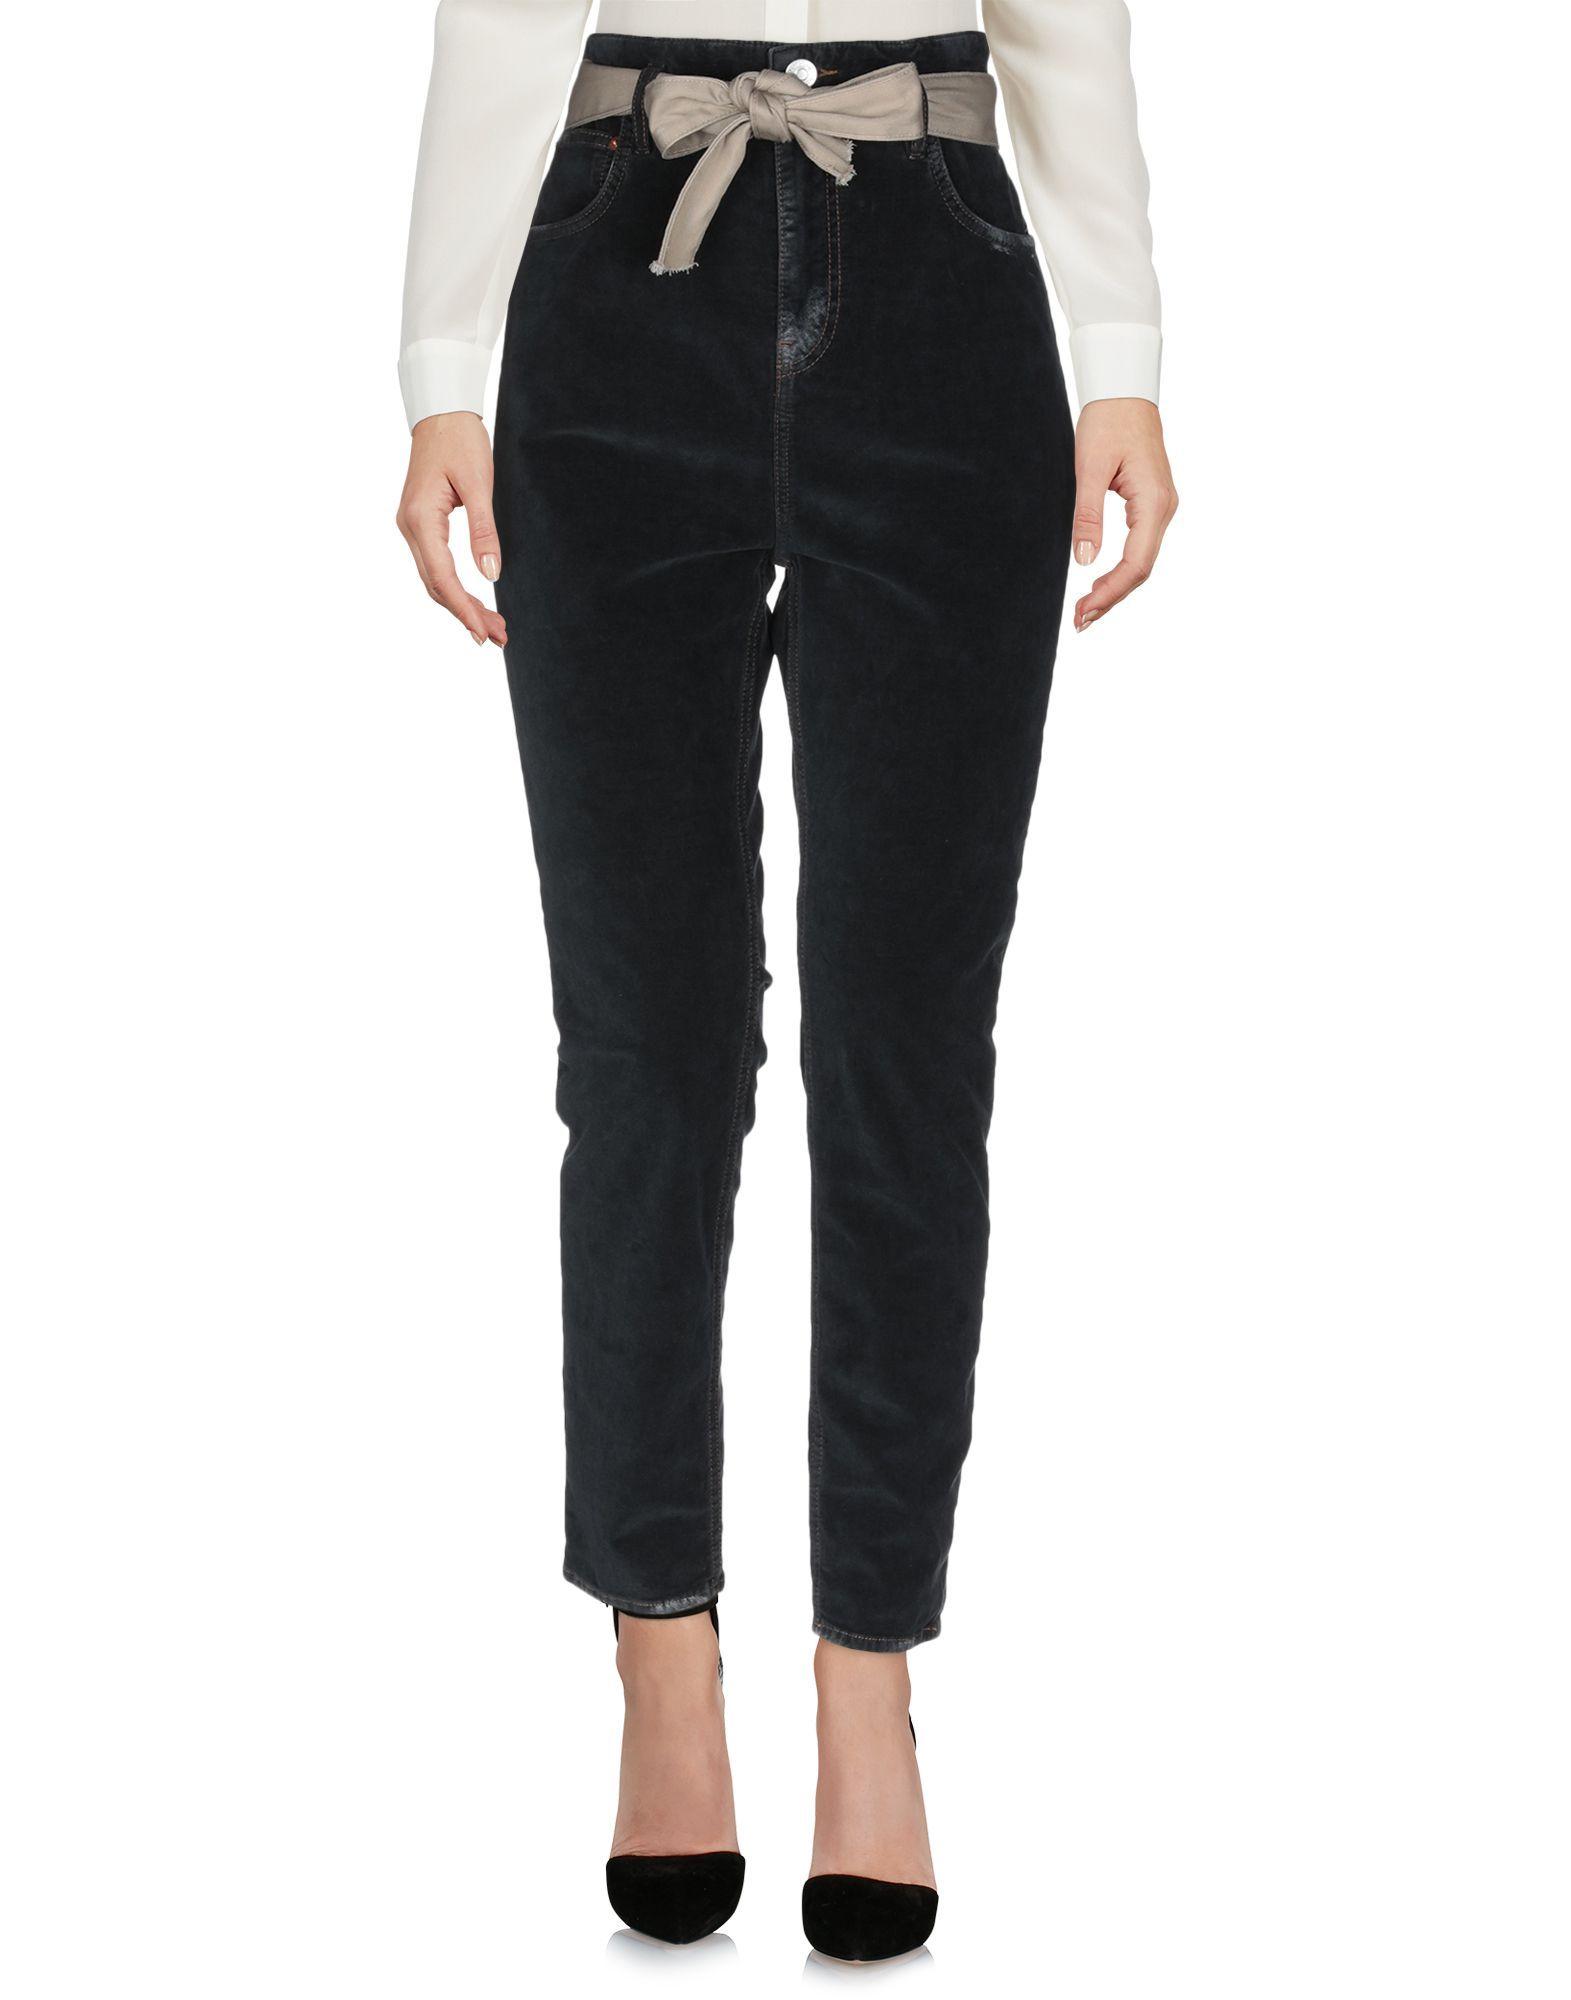 Haikure Steel Grey Cotton Chenille Tapered Leg Trousers